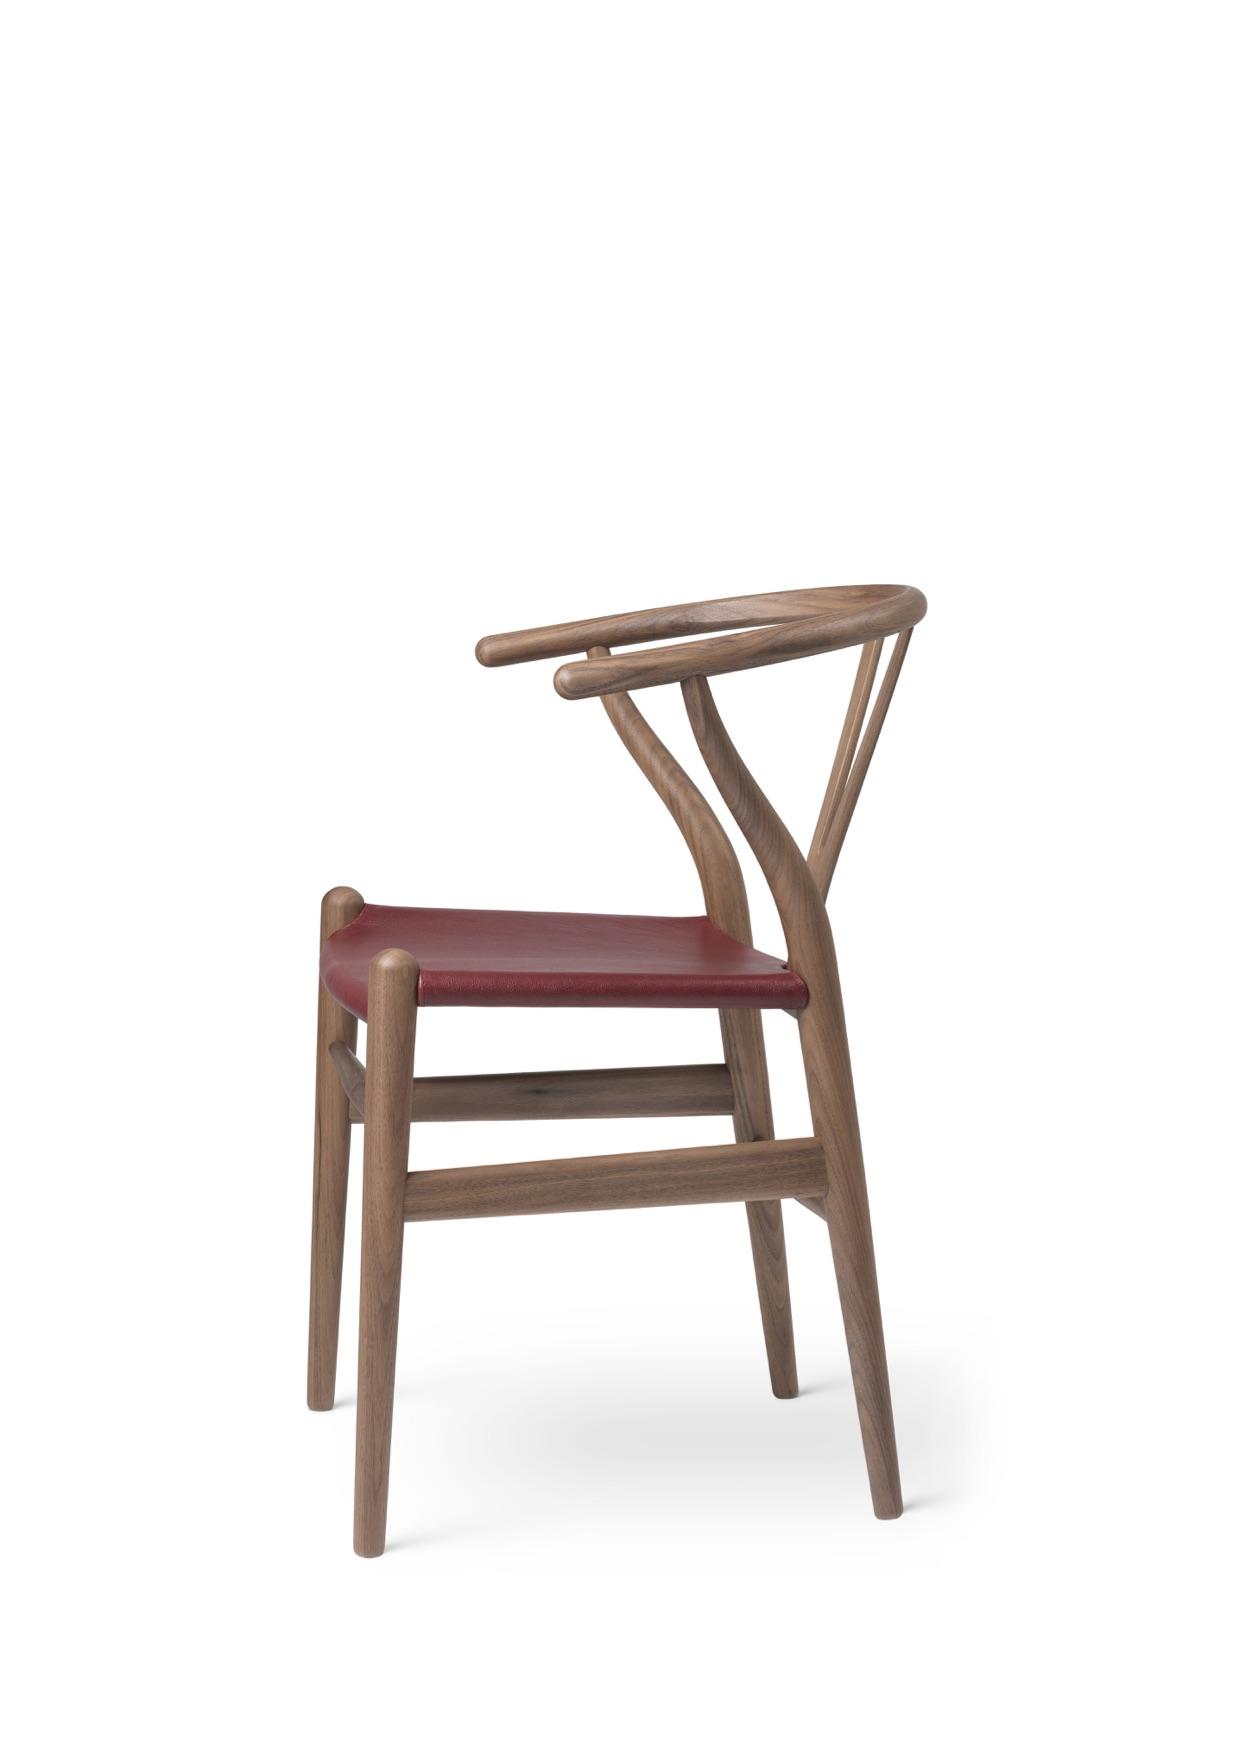 http://www.sora-design.com/images/bl-4447.jpg